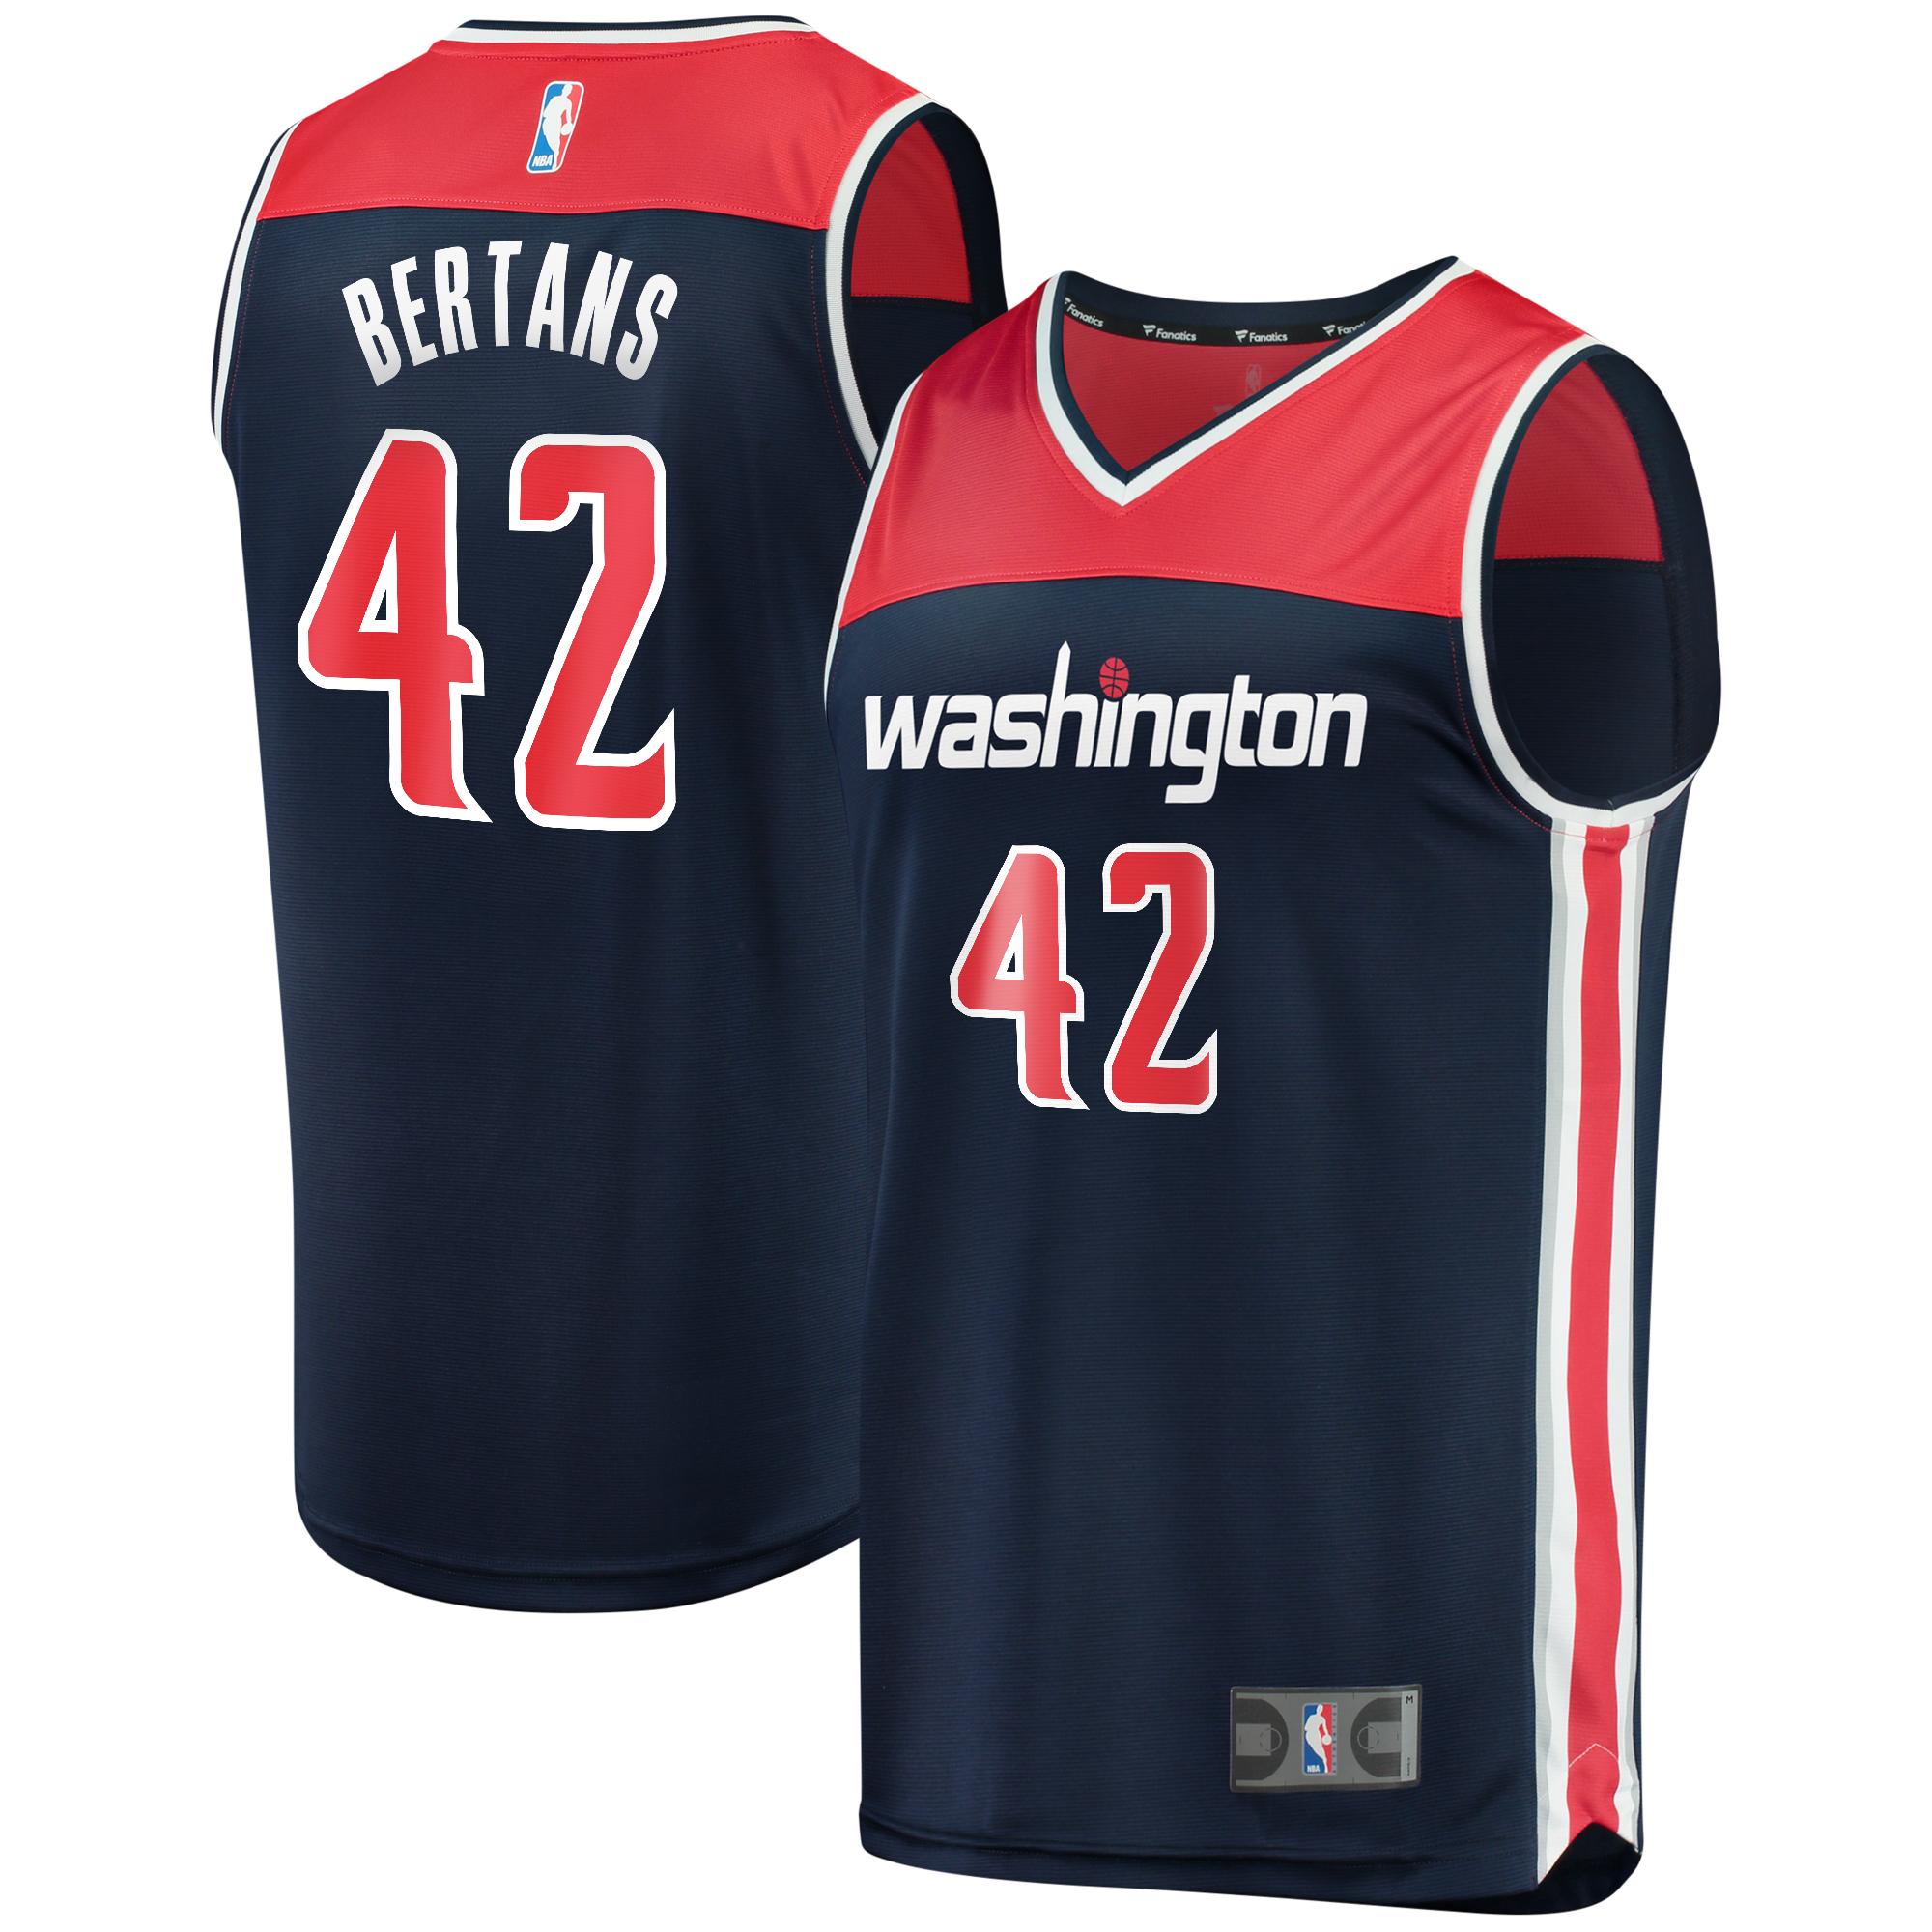 Davis Bertans Washington Wizards Fanatics Branded Fast Break Replica Player Jersey Navy - Statement Edition